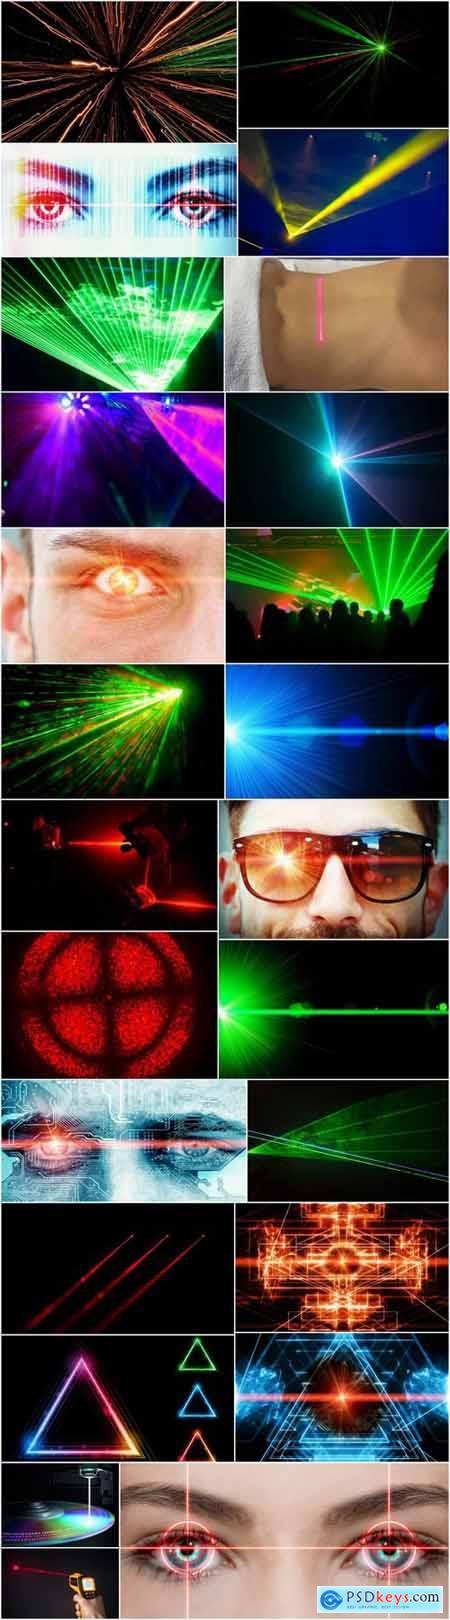 Laser beam light effect illumination 25 HQ Jpeg